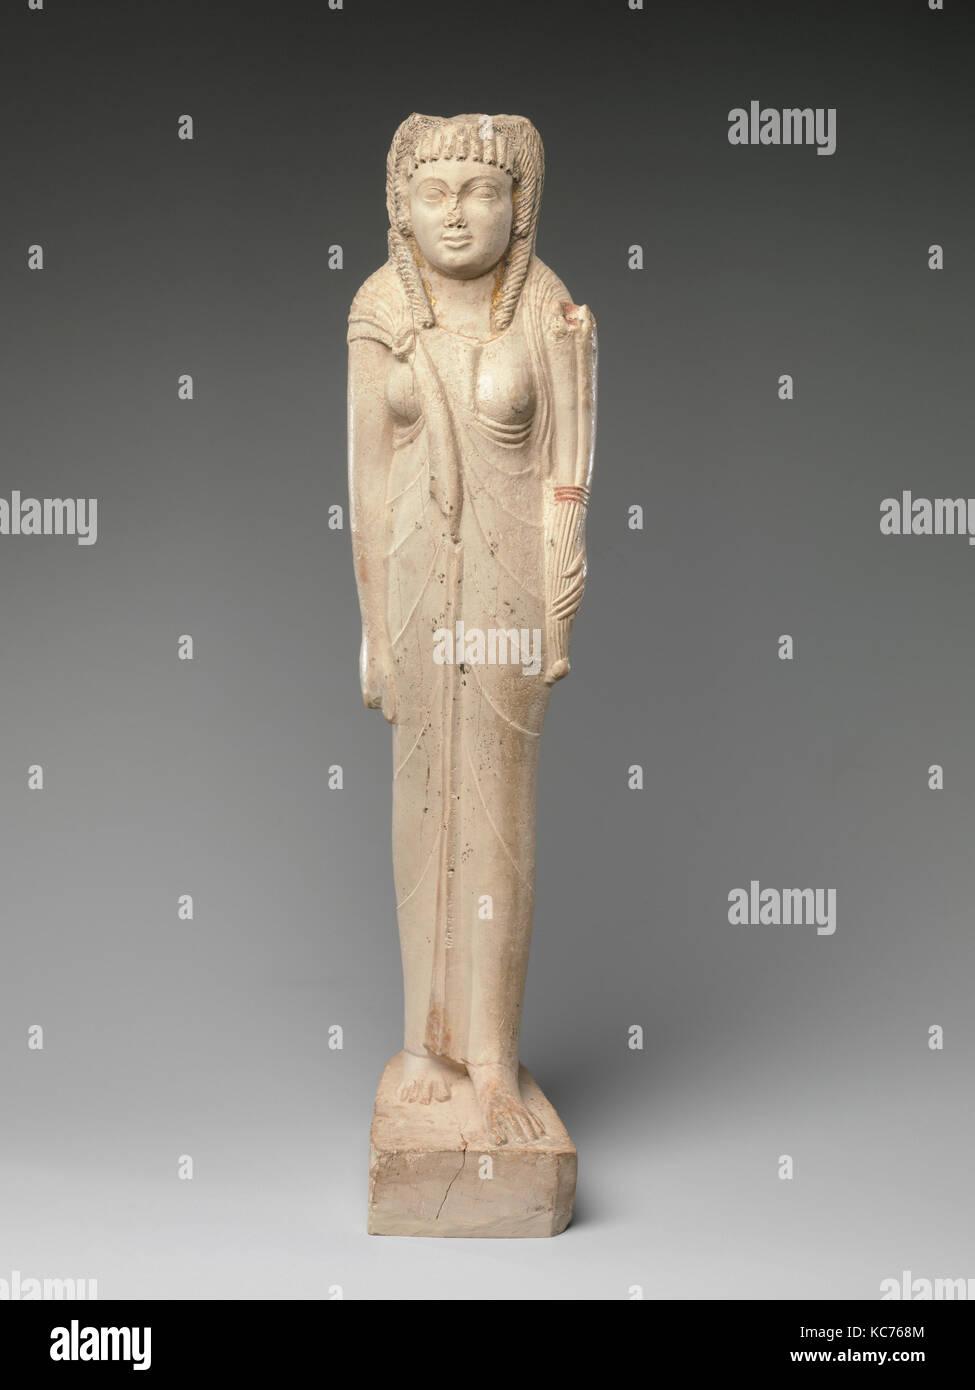 Statuette of Arsinoe II for her Posthumous Cult, ca. 150–100 B.C - Stock Image